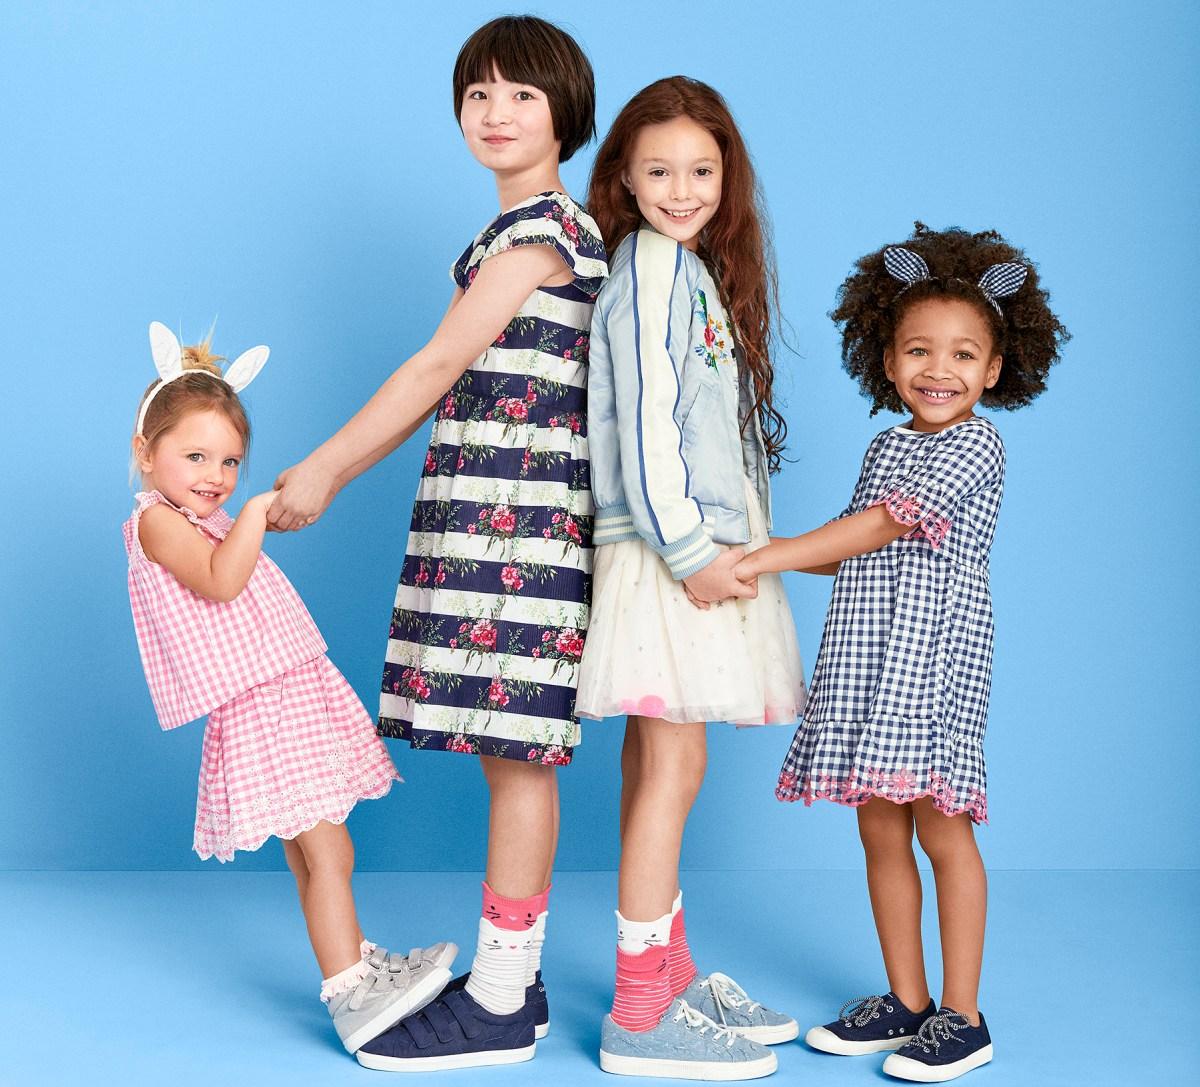 Sarah Jessica Parker x Gap Kids Clothing Collection: Details